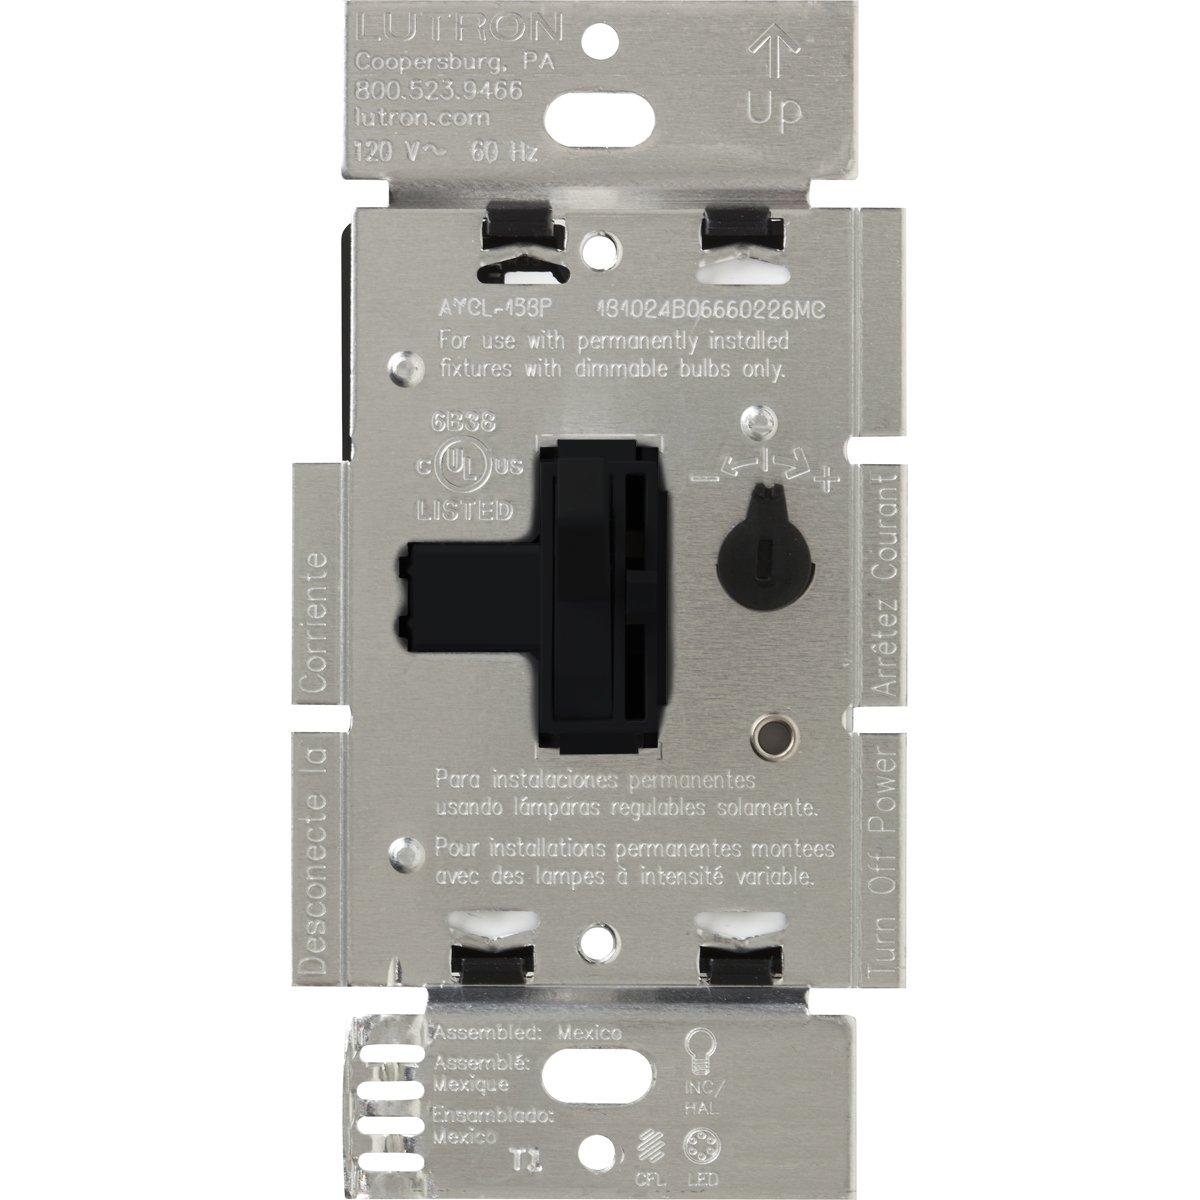 Lutron Ariadni 250-wattシングルポール/ 3ウェイCFL / LEDディマー AYCL-253P-BL 1 B00LC9UR10 ブラック ブラック